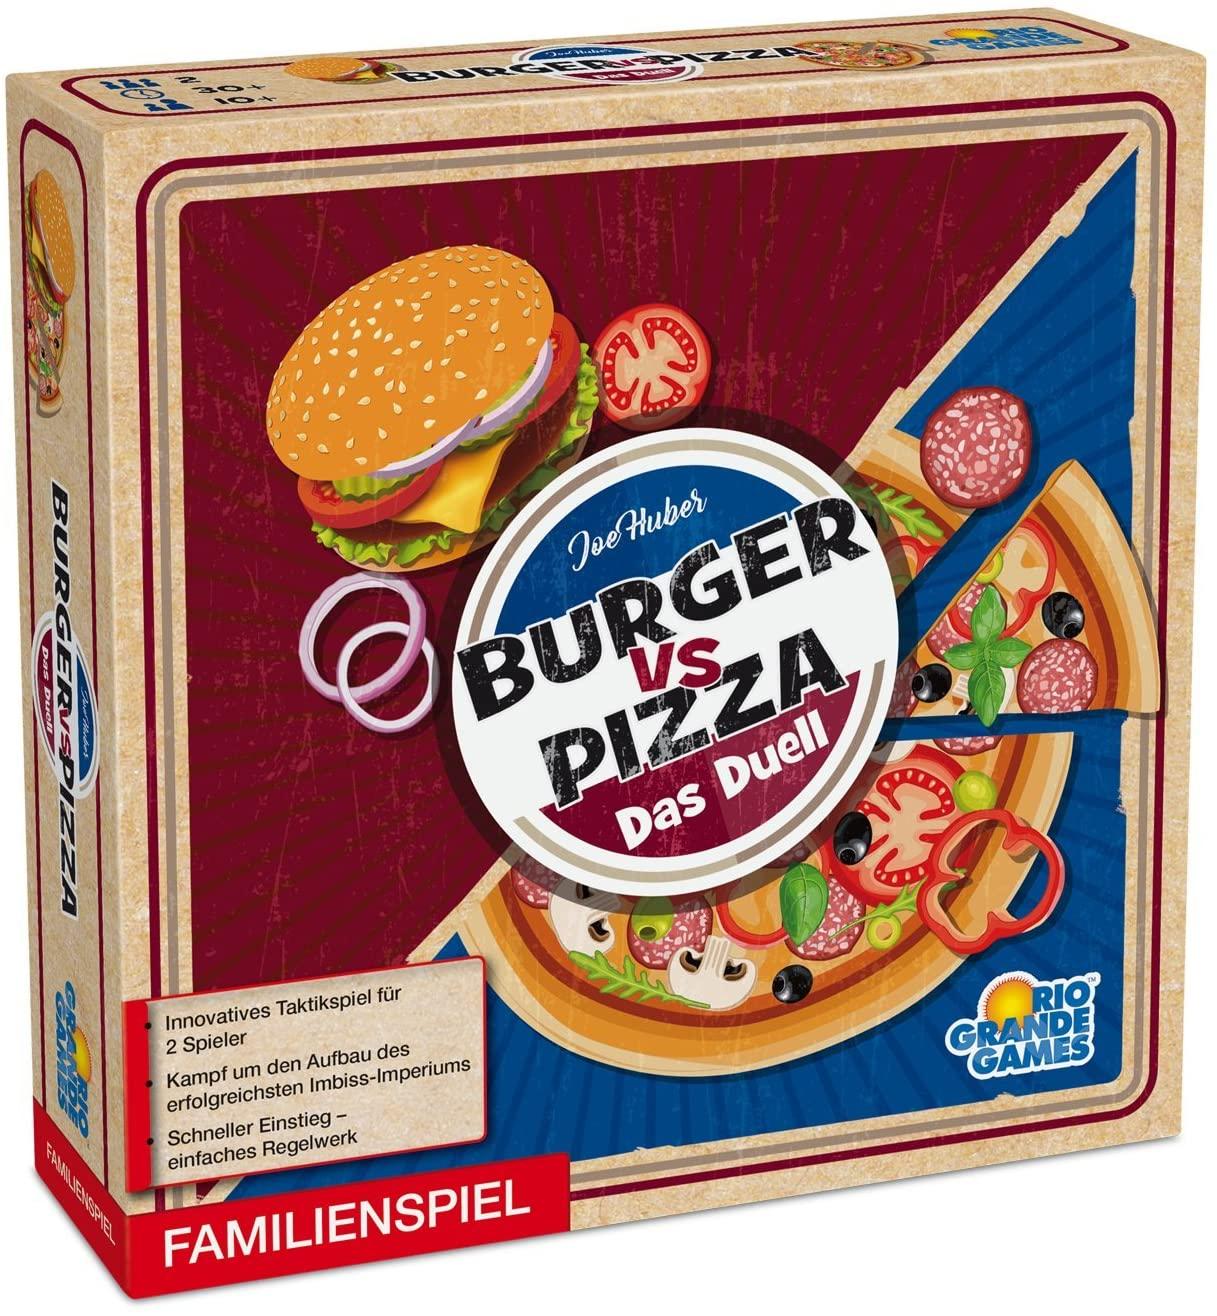 Burger vs Pizza - Das Duell (2 Personen Brettspiel, Gesellschaftsspiel)